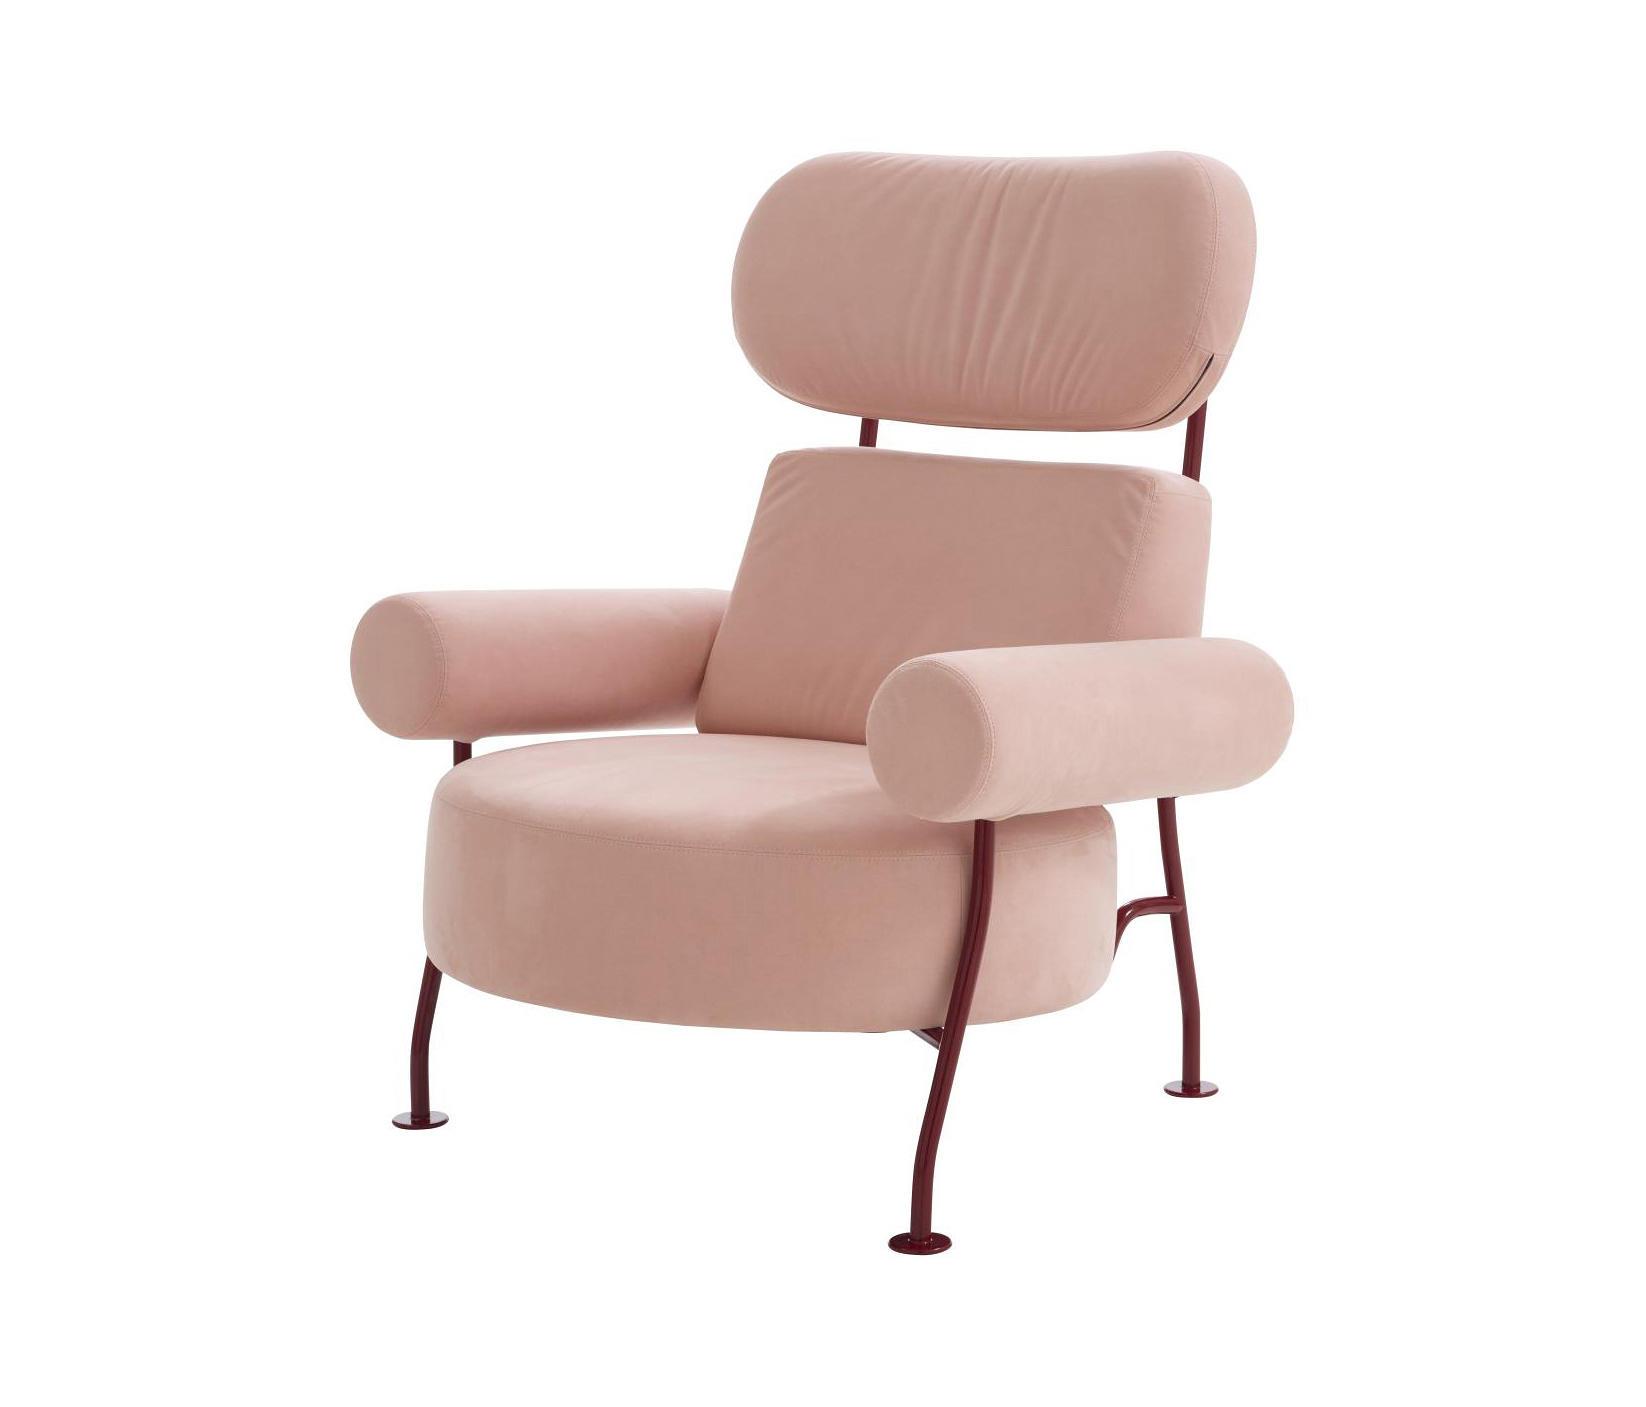 astair sessel mit armlehnen sessel von ligne roset. Black Bedroom Furniture Sets. Home Design Ideas